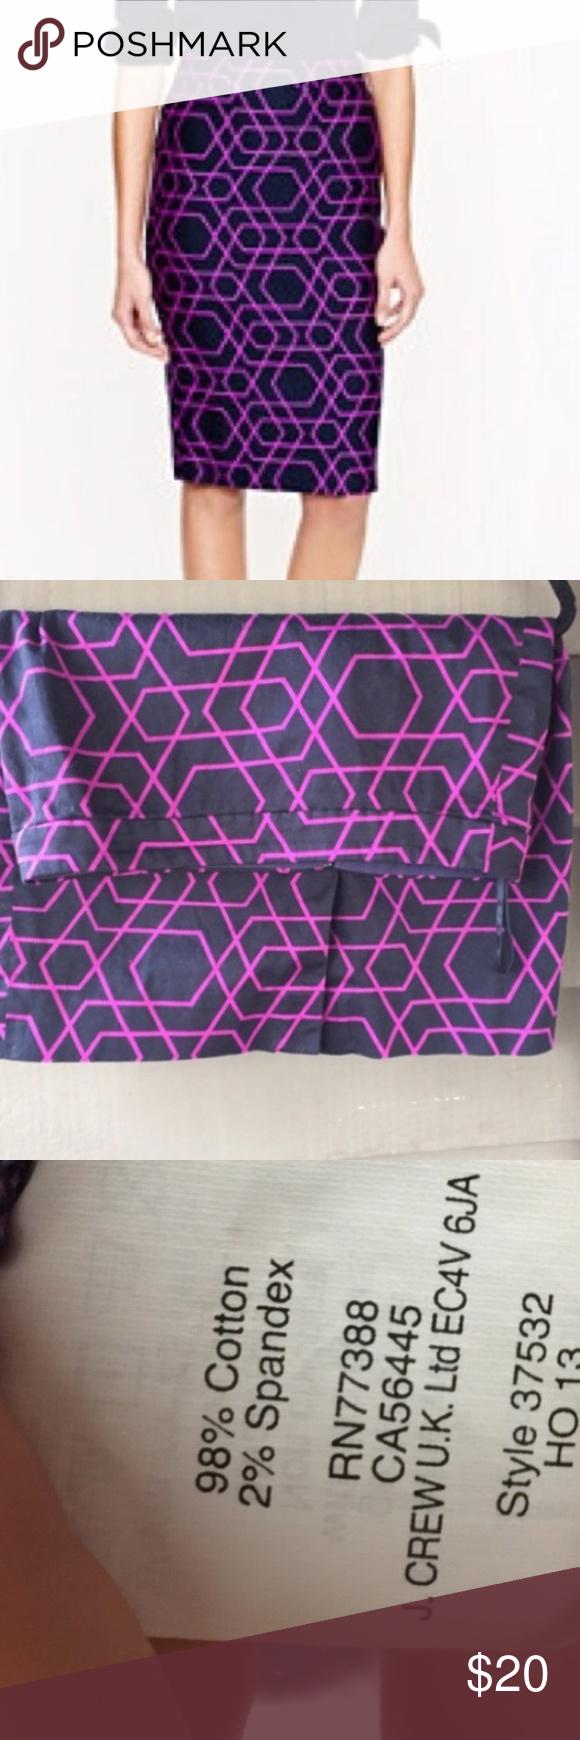 J. Crew black and purple geometric pencil skirt Reposhing - J. Crew pencil skirt, lightweight cotton.  Great fit! J. Crew Skirts Pencil